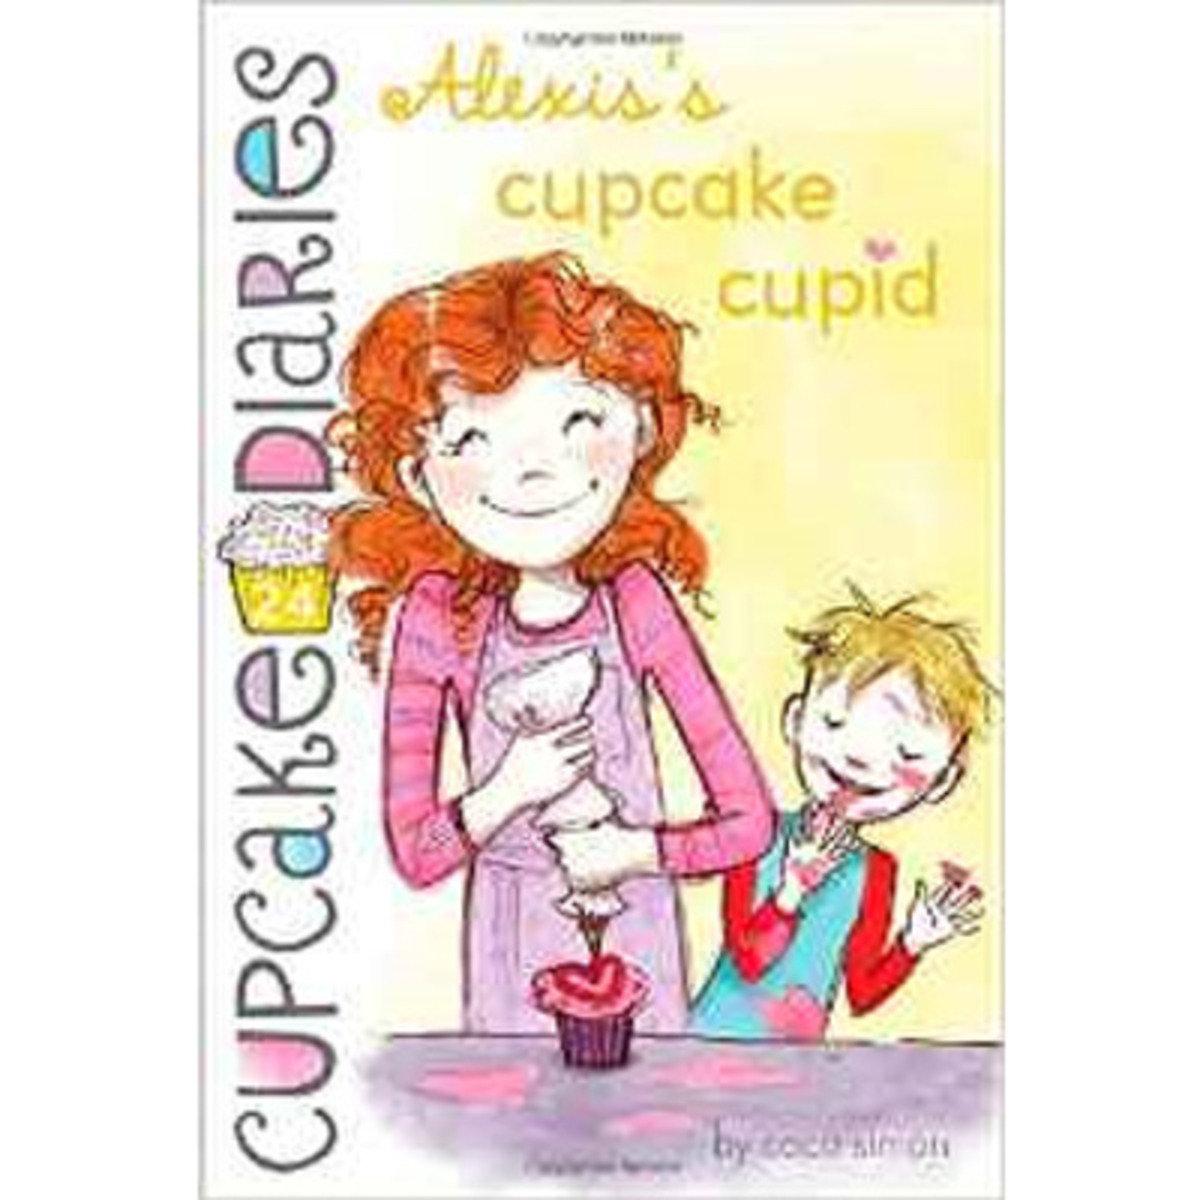 CUPCAKE DIARIES #24 ALEXIS'S CUPCAKE CUPID 9781481428644